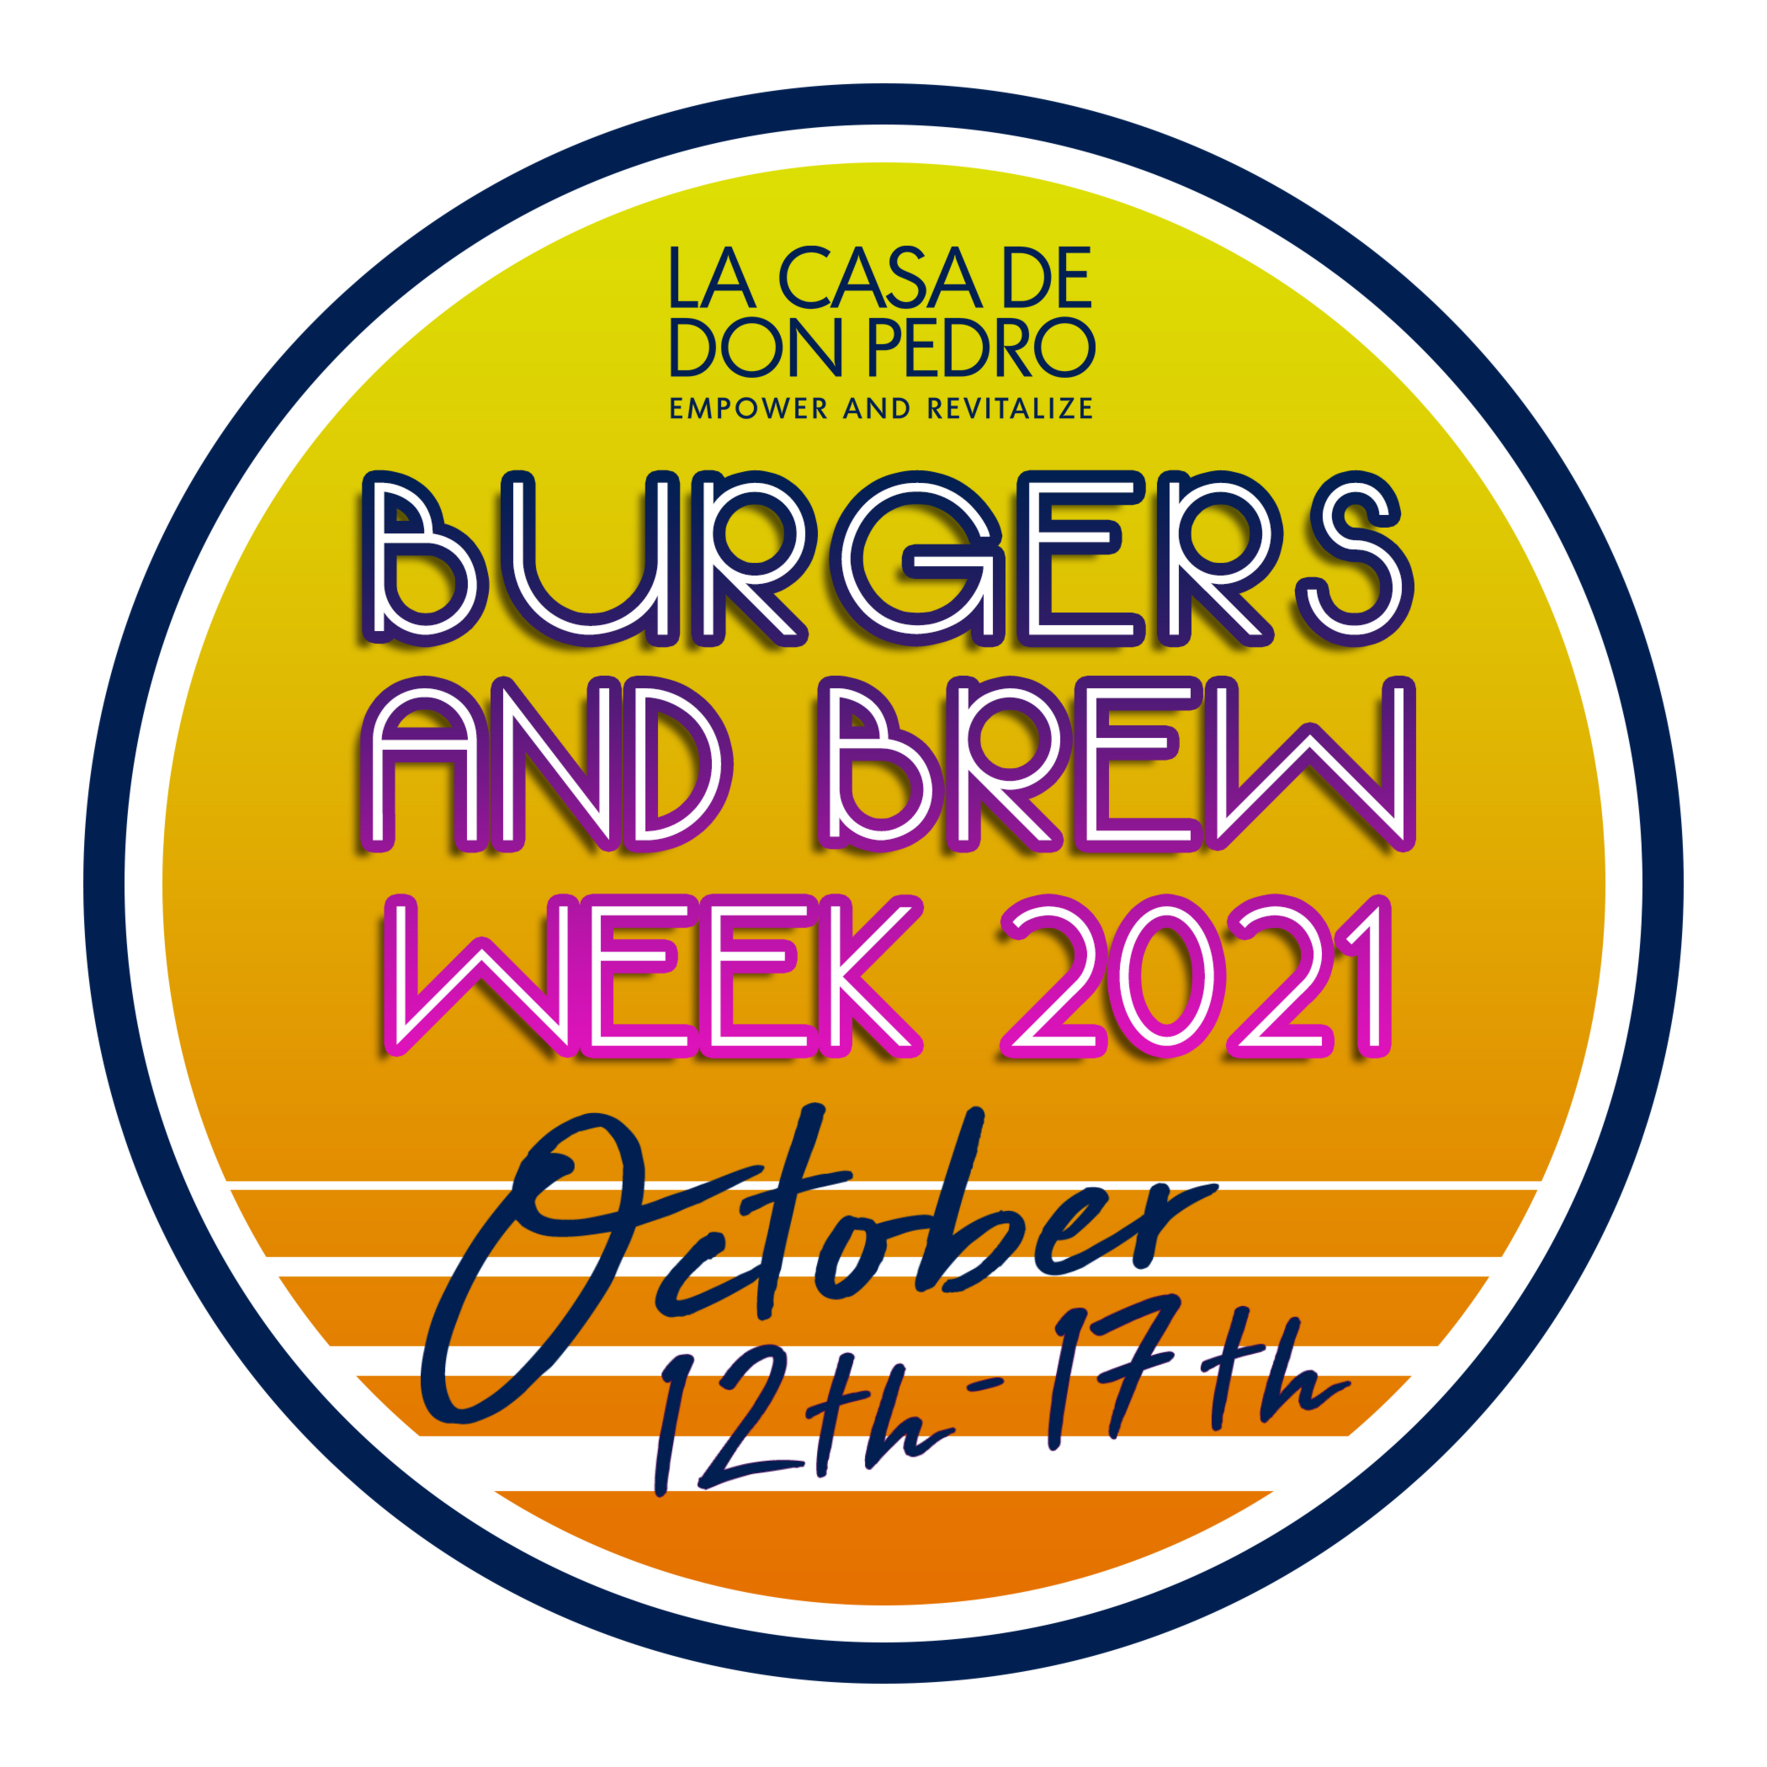 Burgers and Brew Week 2021 image